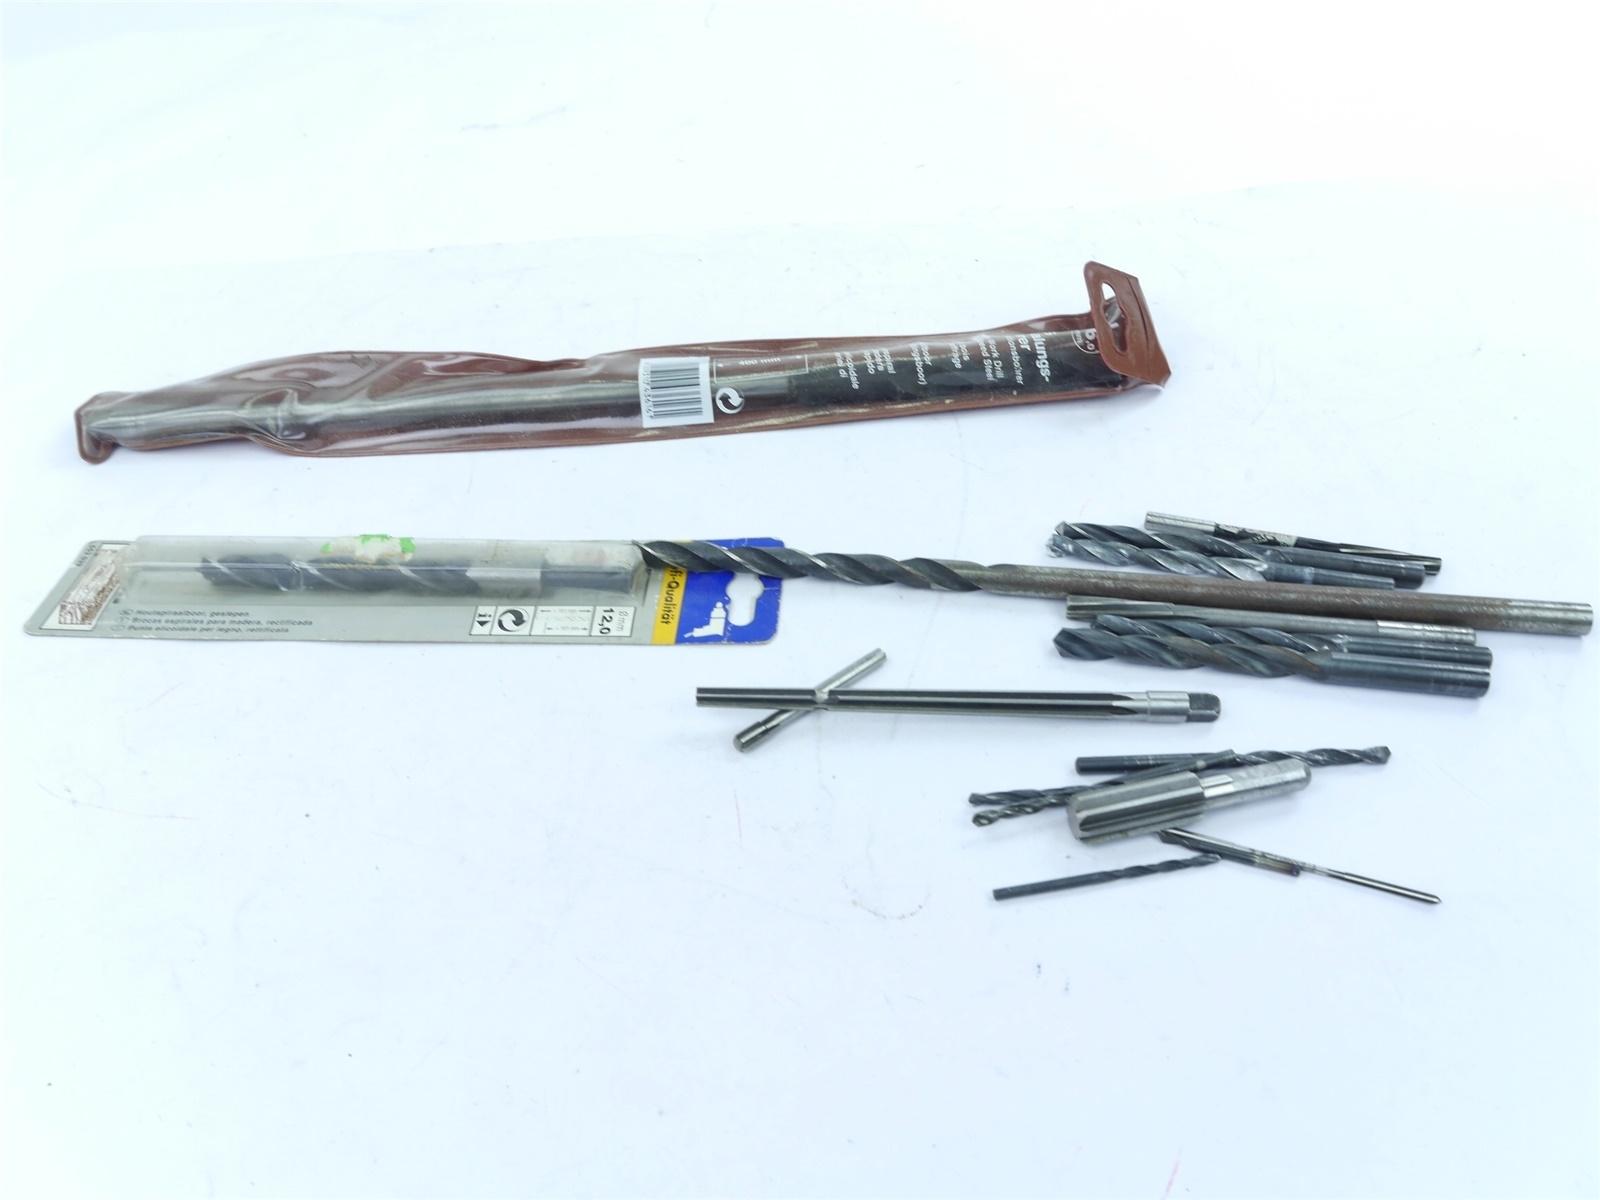 E122 Lux kwb u.a. - Werkzeug Bohrer Spiralbohrer Schalungsbohrer Konvolut